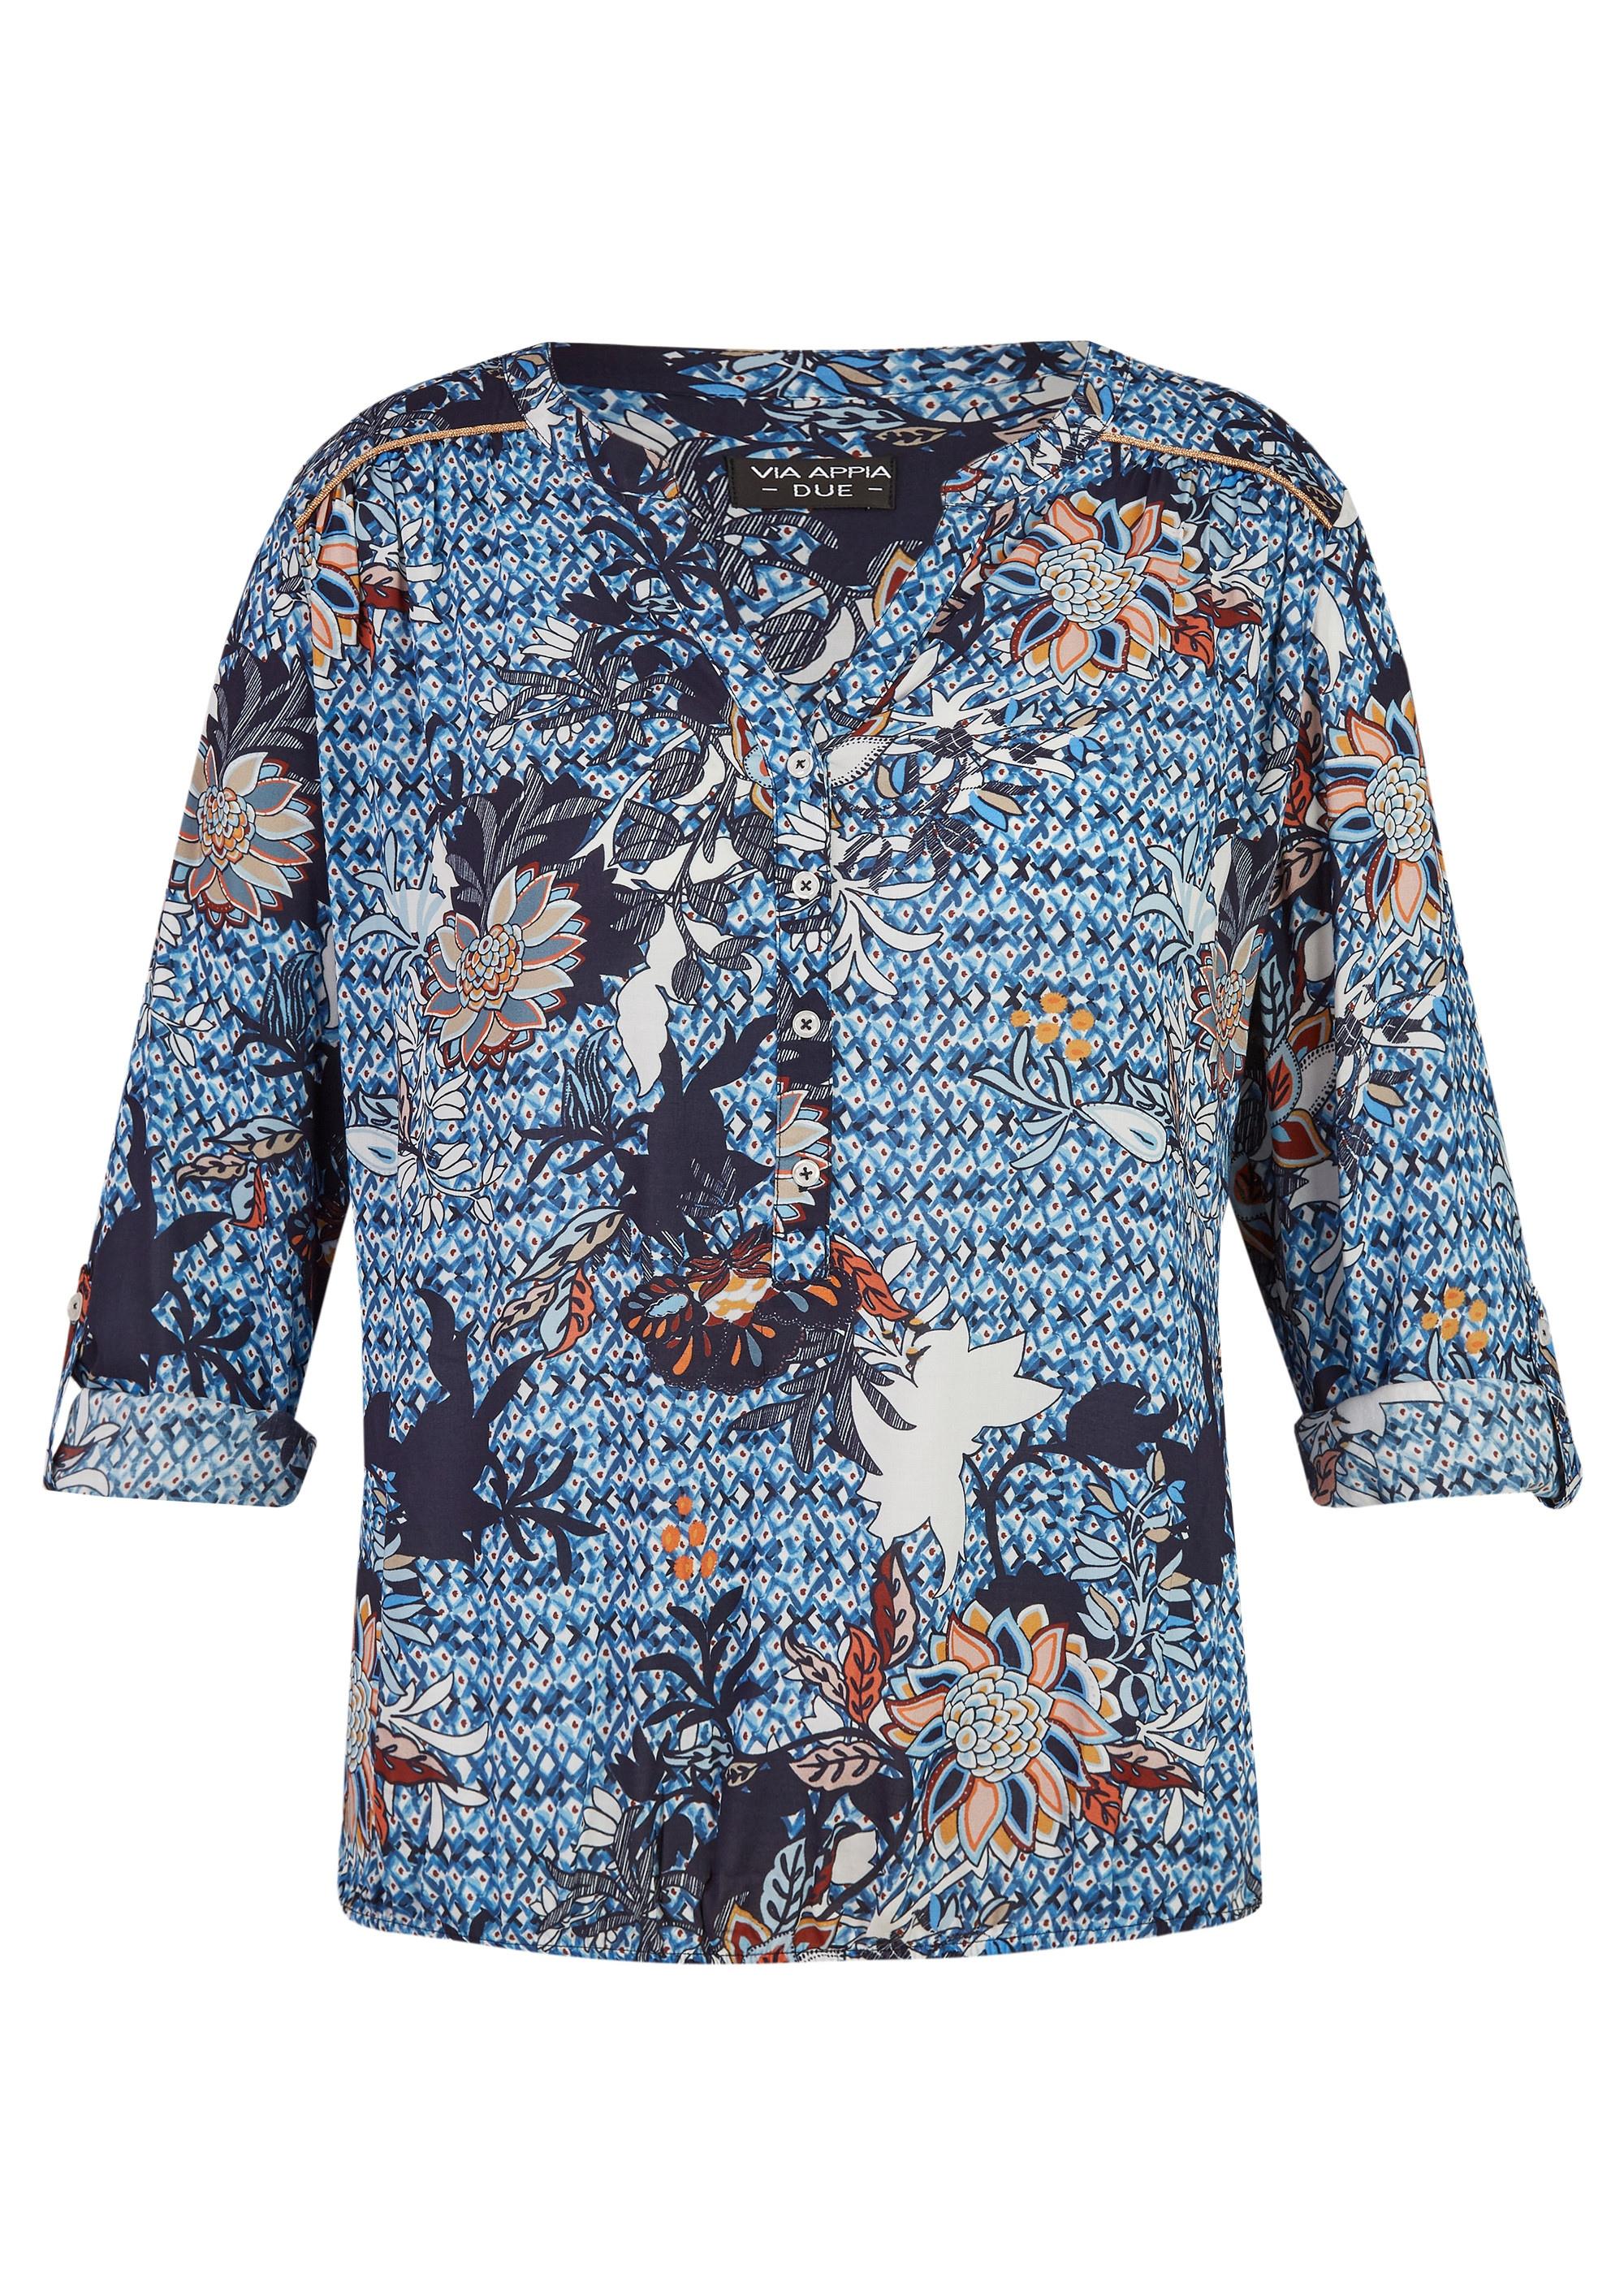 VIA APPIA DUE Leichte Bluse mit Allover-Print